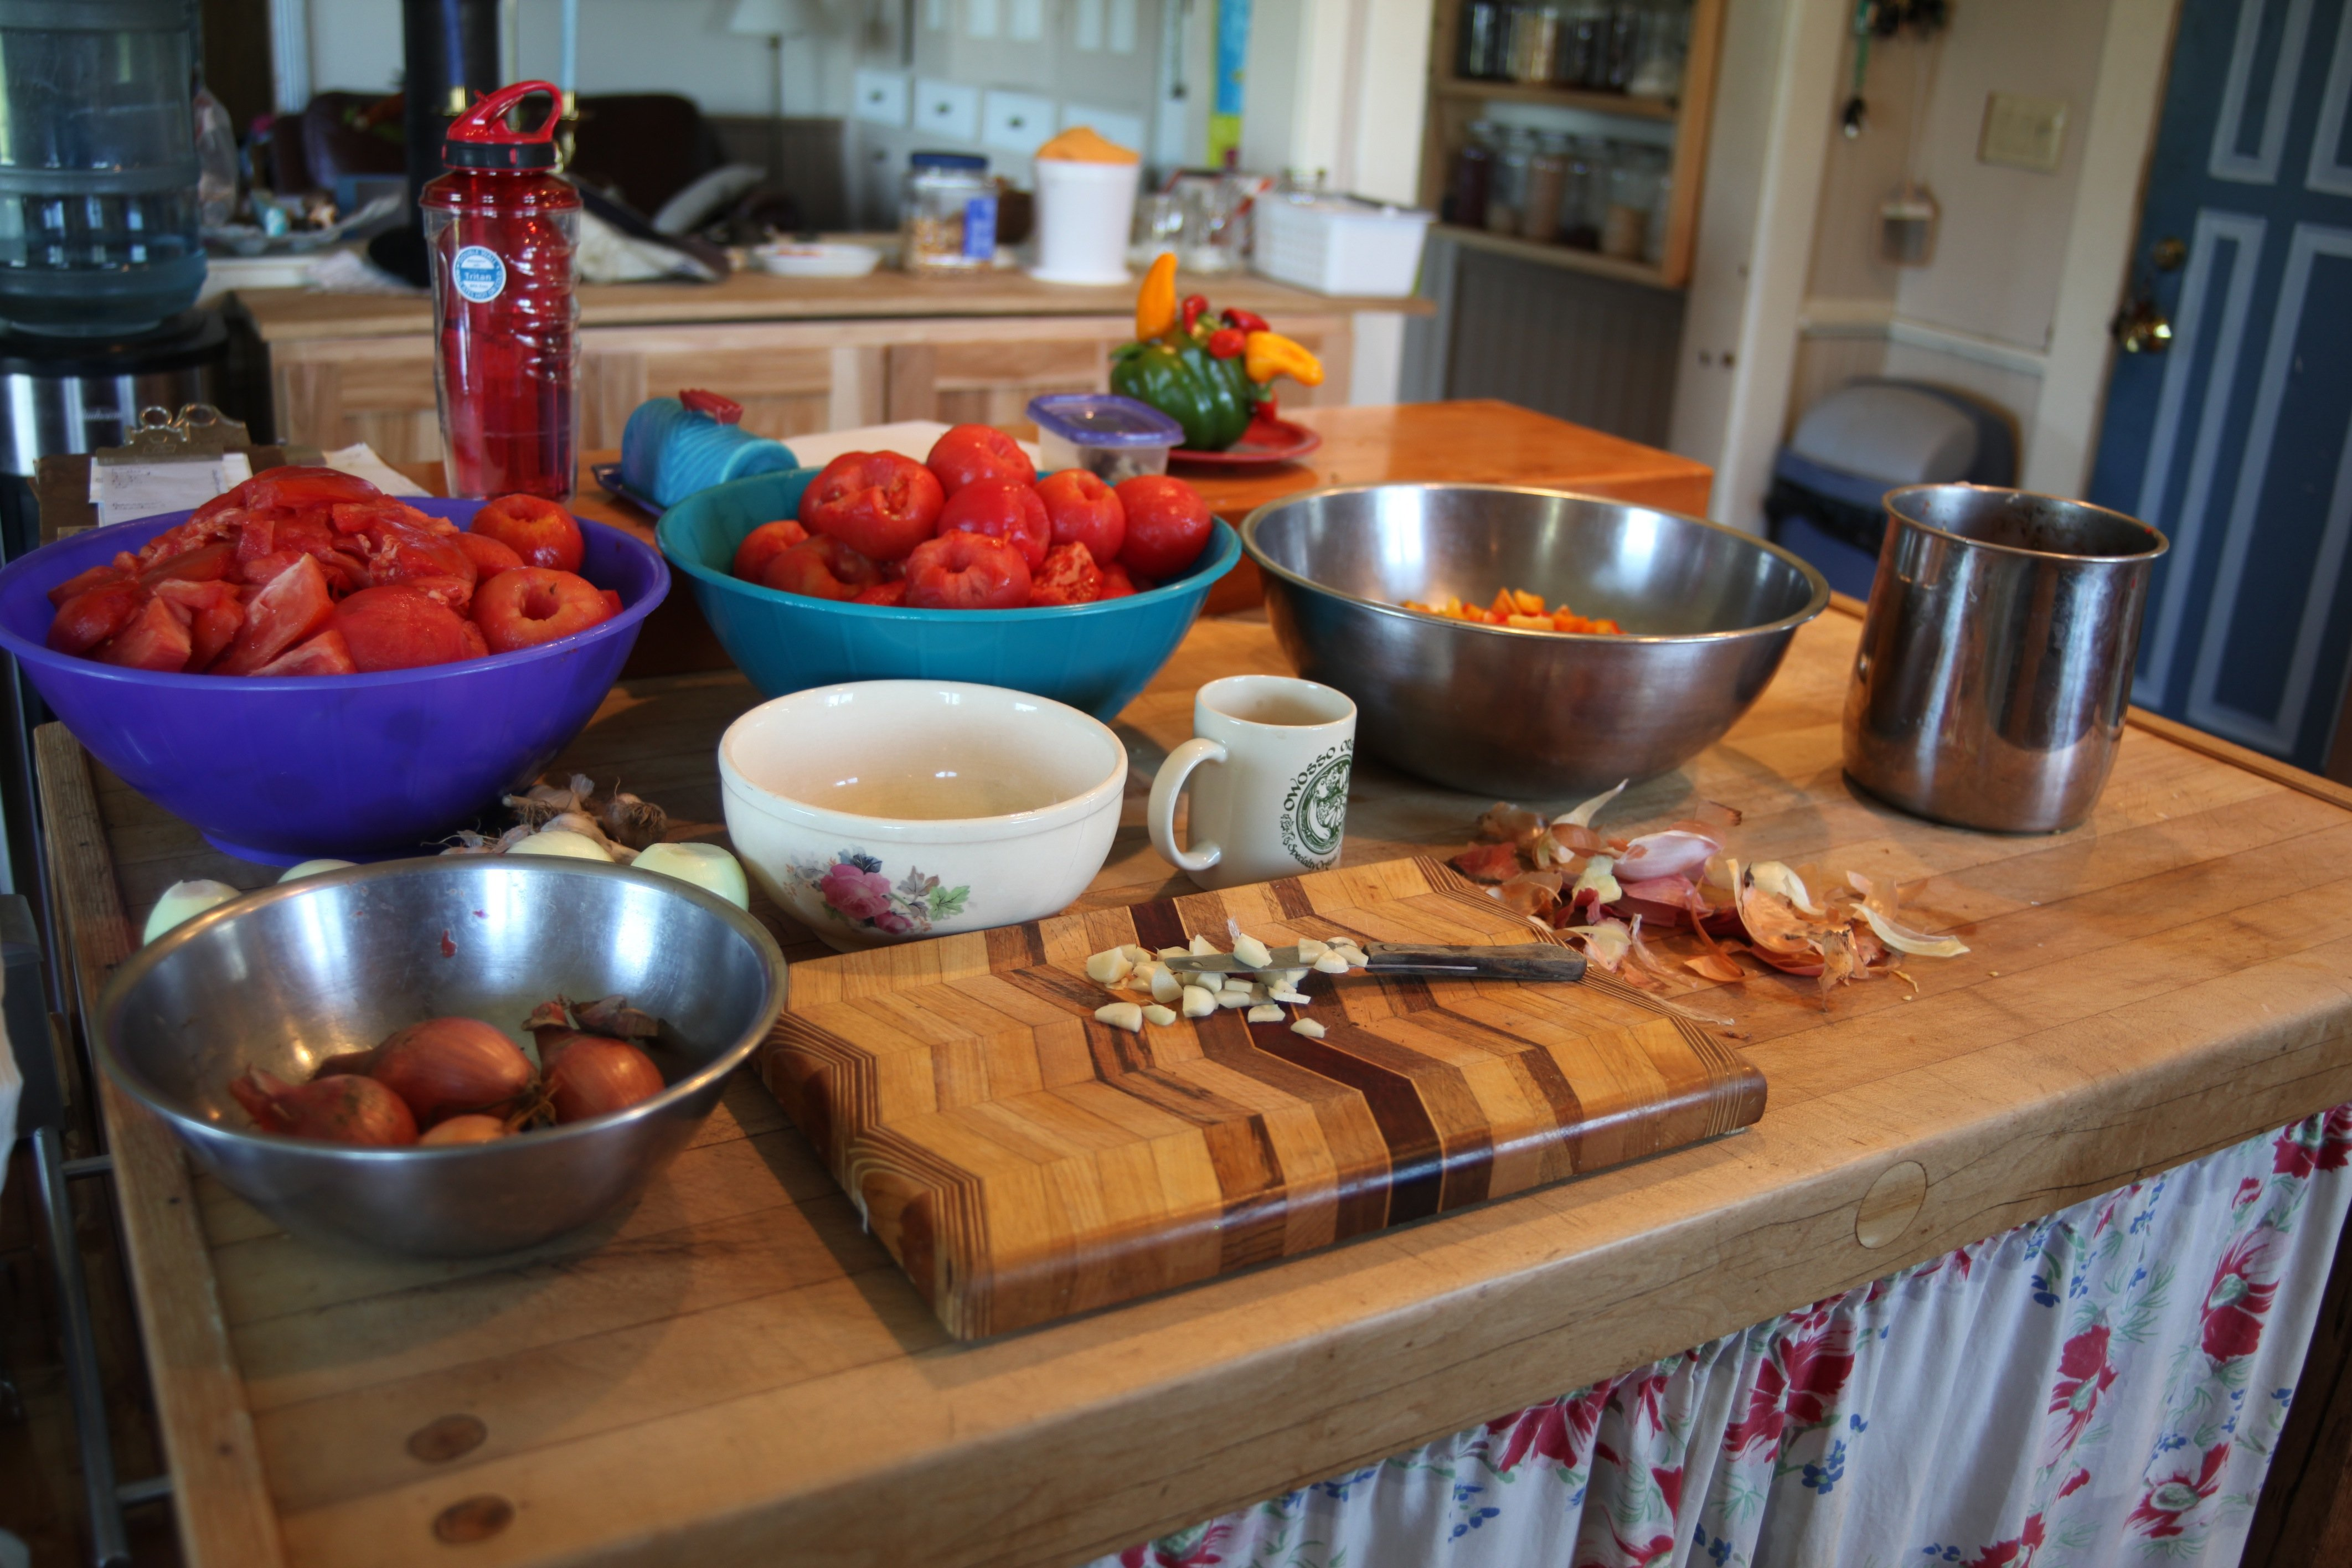 tomato sauce #1